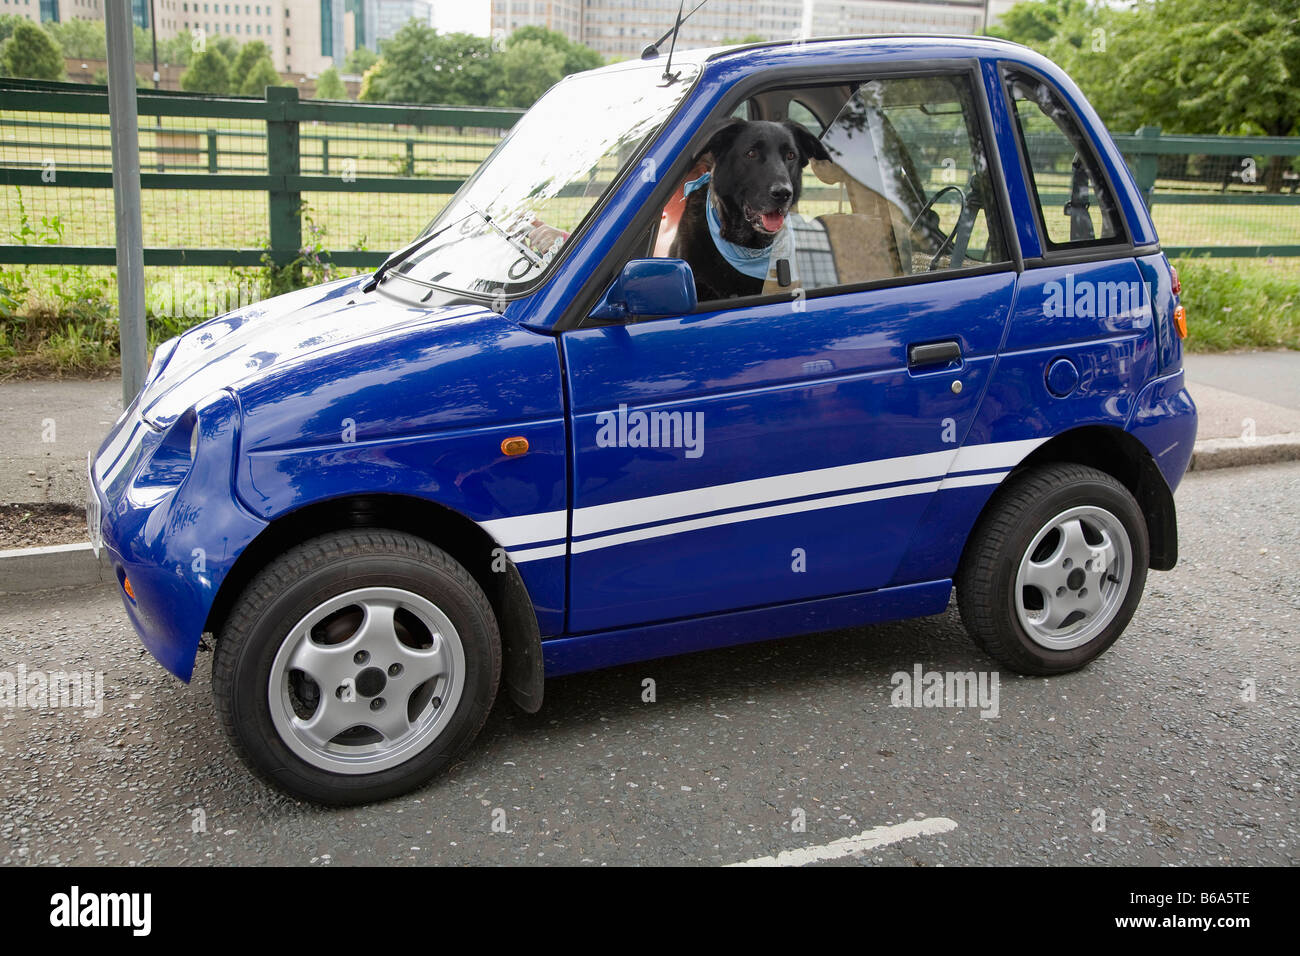 Dog panting in electric car - Stock Image